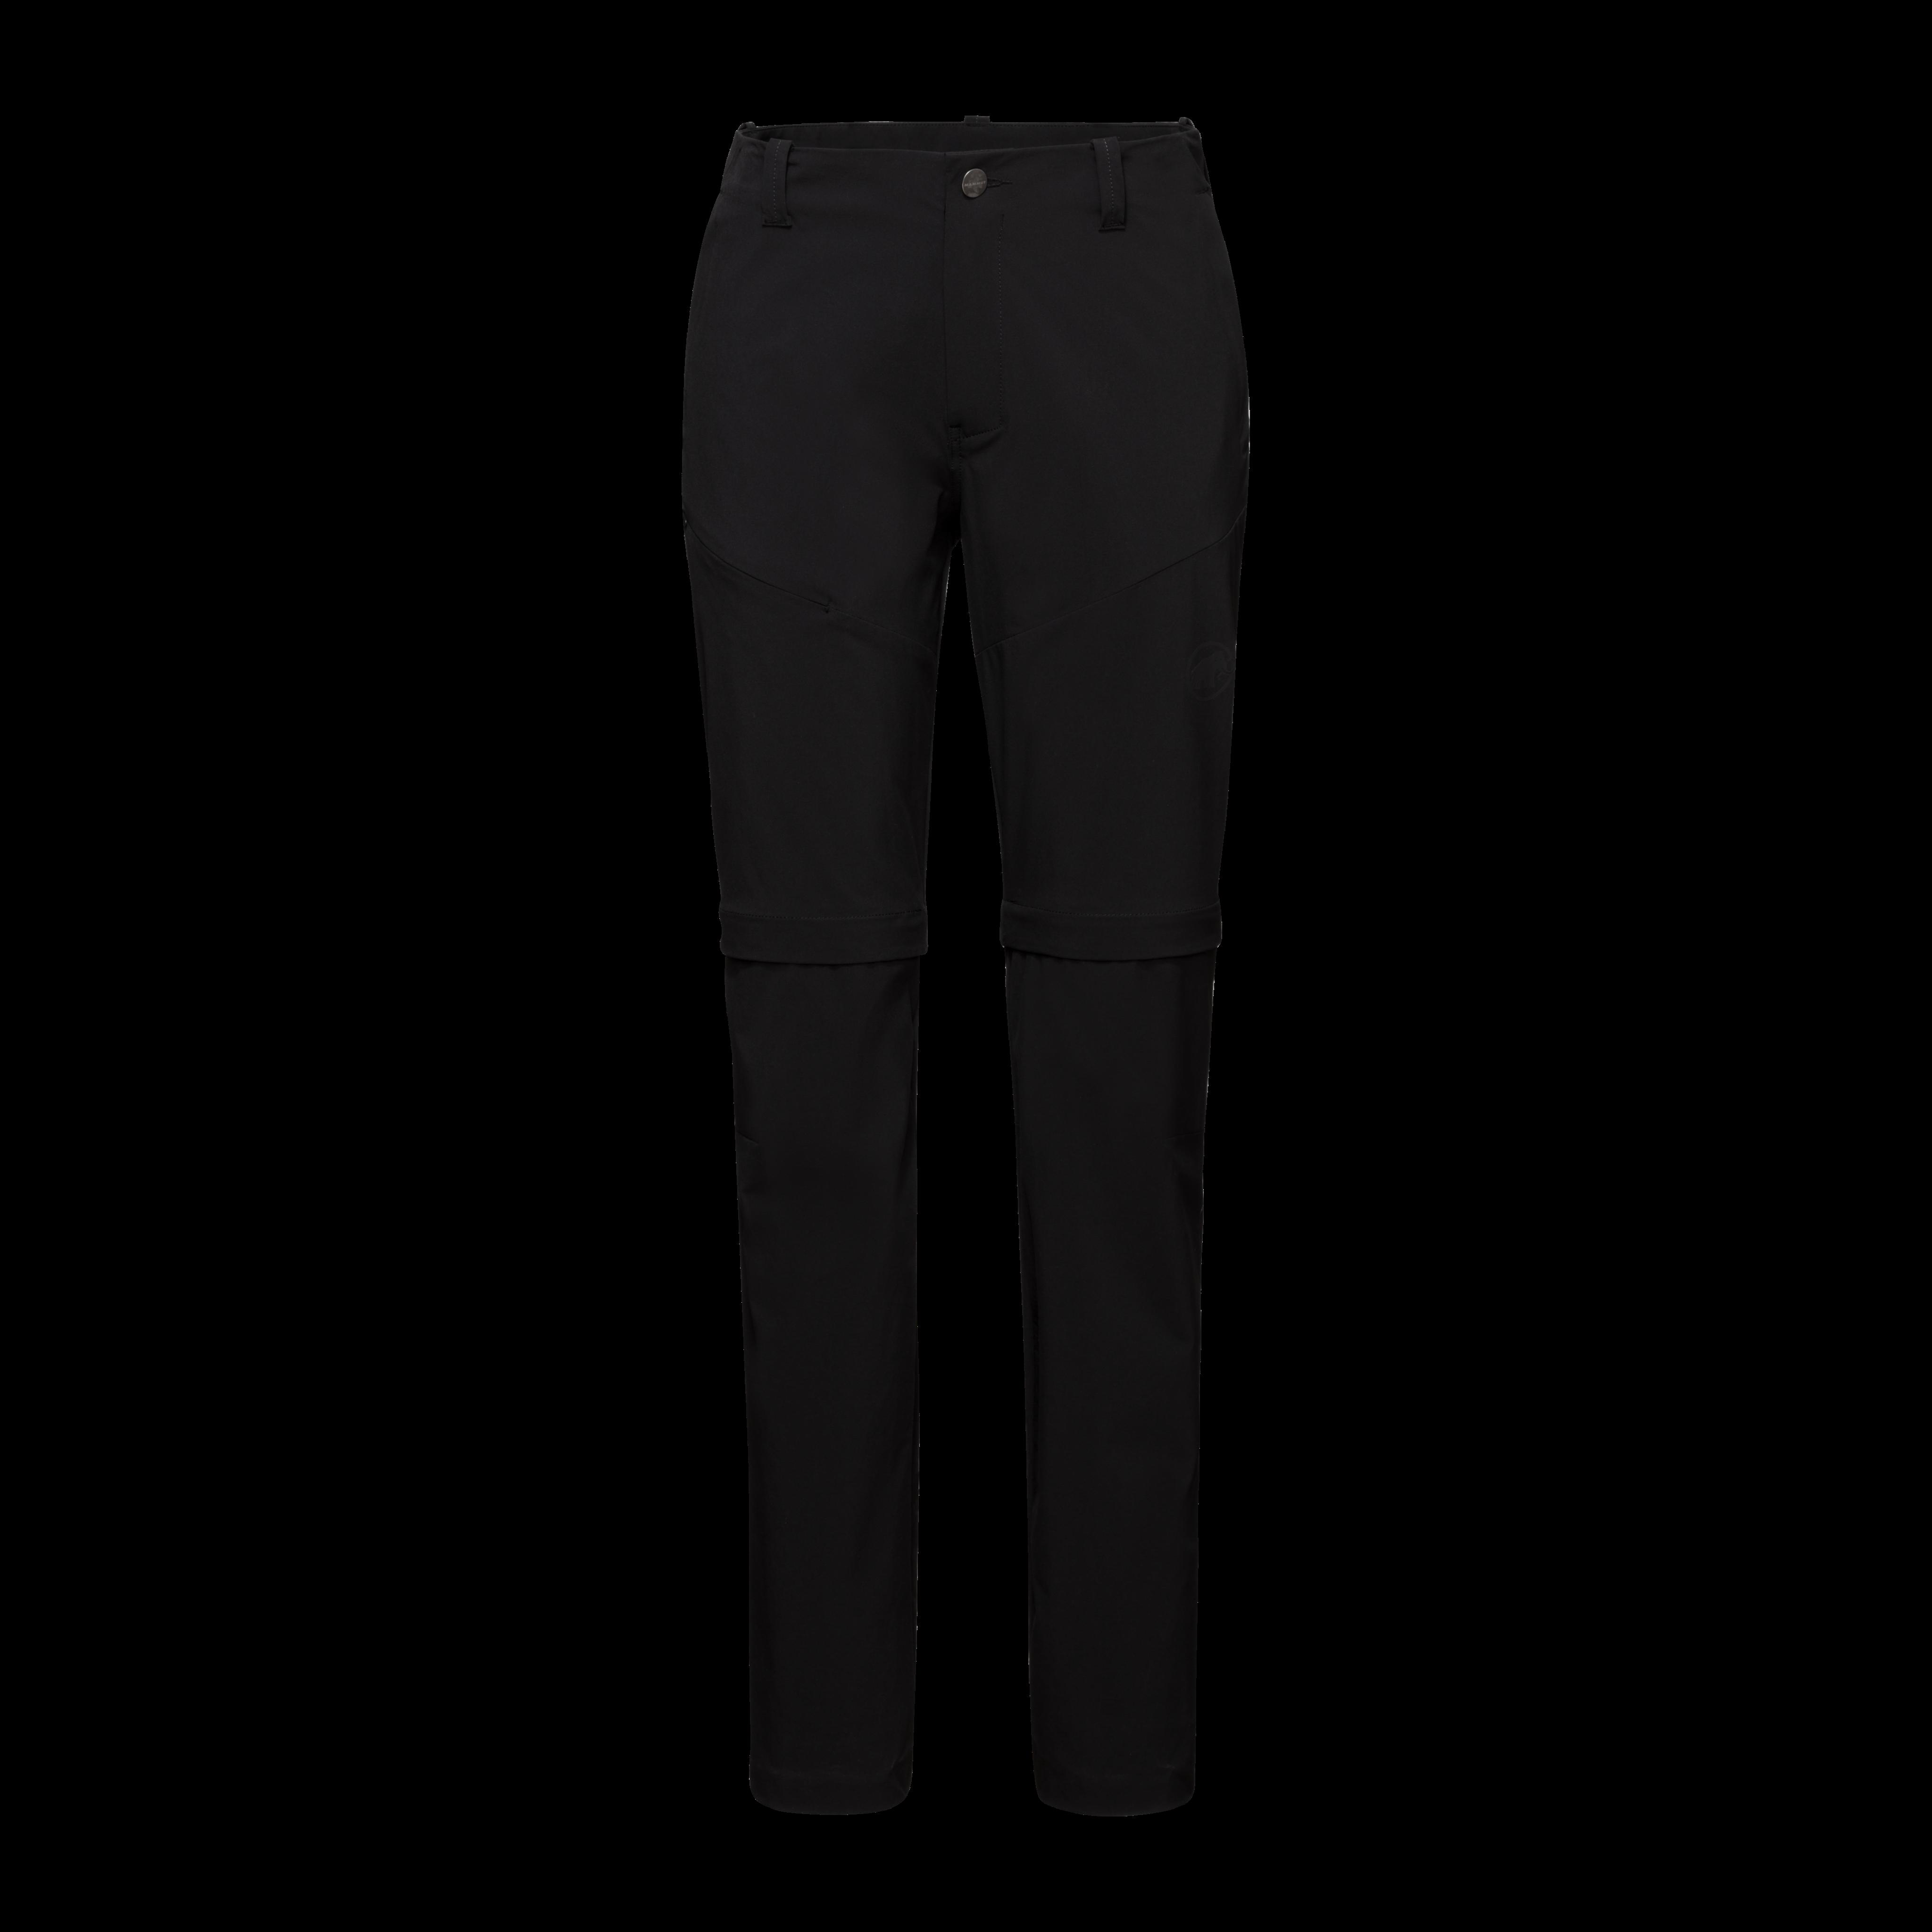 Runbold Zip Off Pants Women - black, normal, UK 12 thumbnail